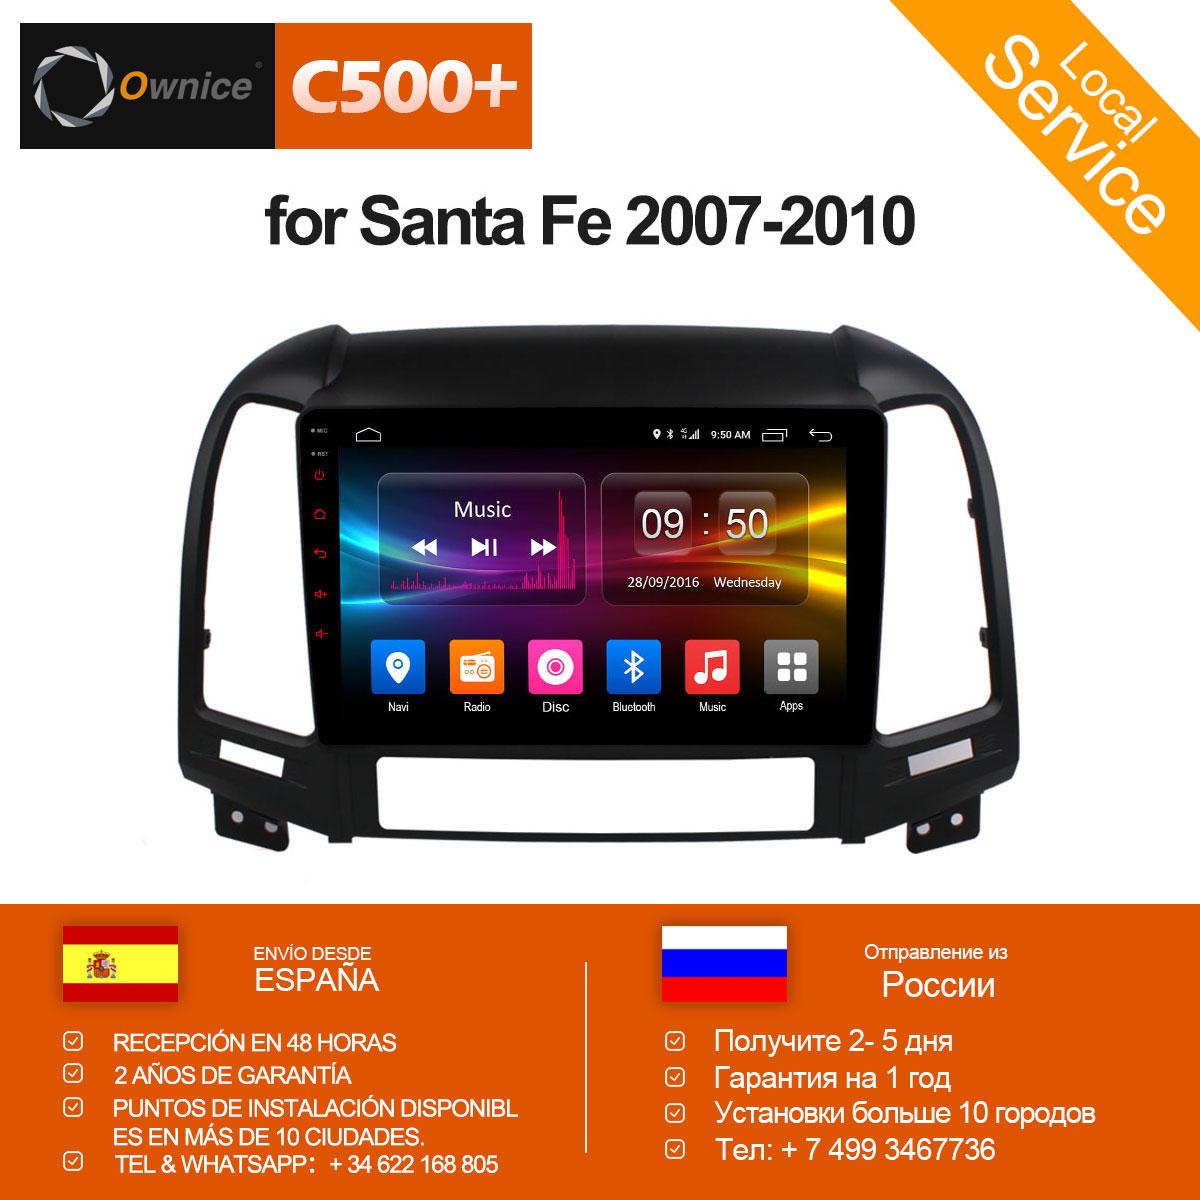 Ownice C500+ G10 Octa Core Android 8.1 Car DVD for Hyundai Santa Fe 2007 - 2010 Radio Navigation gps player 32G+2G 4G SIM LTE ownice c500 4g sim lte octa 8 core android 6 0 for kia ceed 2013 2015 car dvd player gps navi radio wifi 4g bt 2gb ram 32g rom